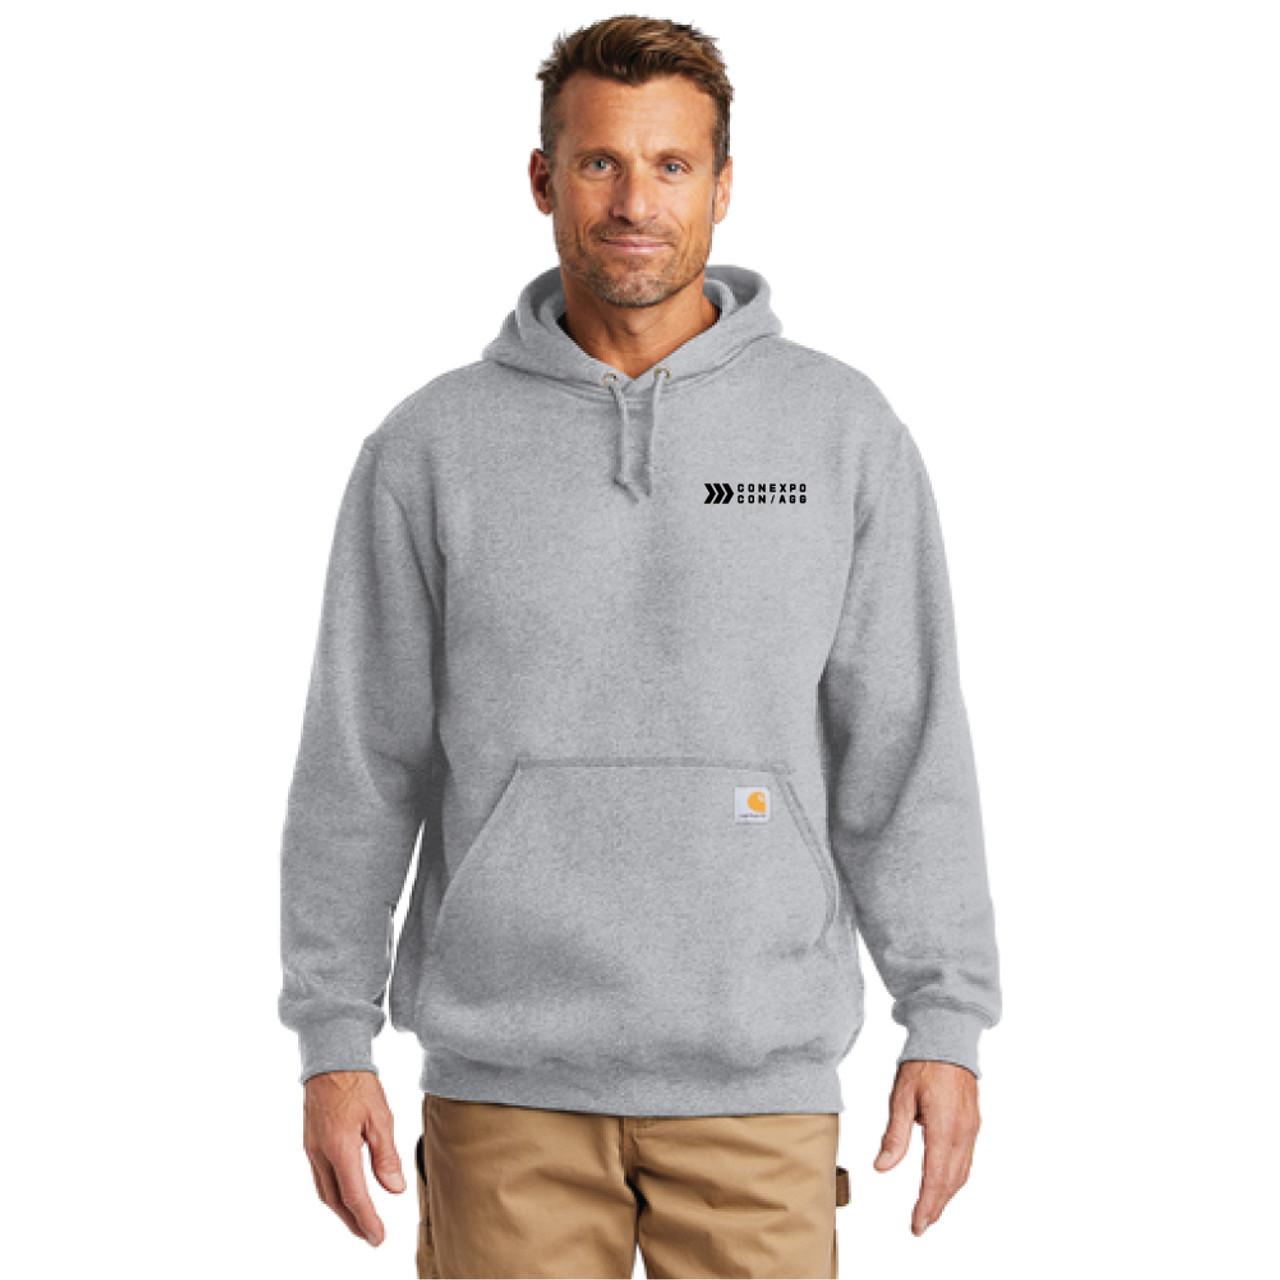 Carhartt Heather Gray Hooded Pullover Sweatshirt